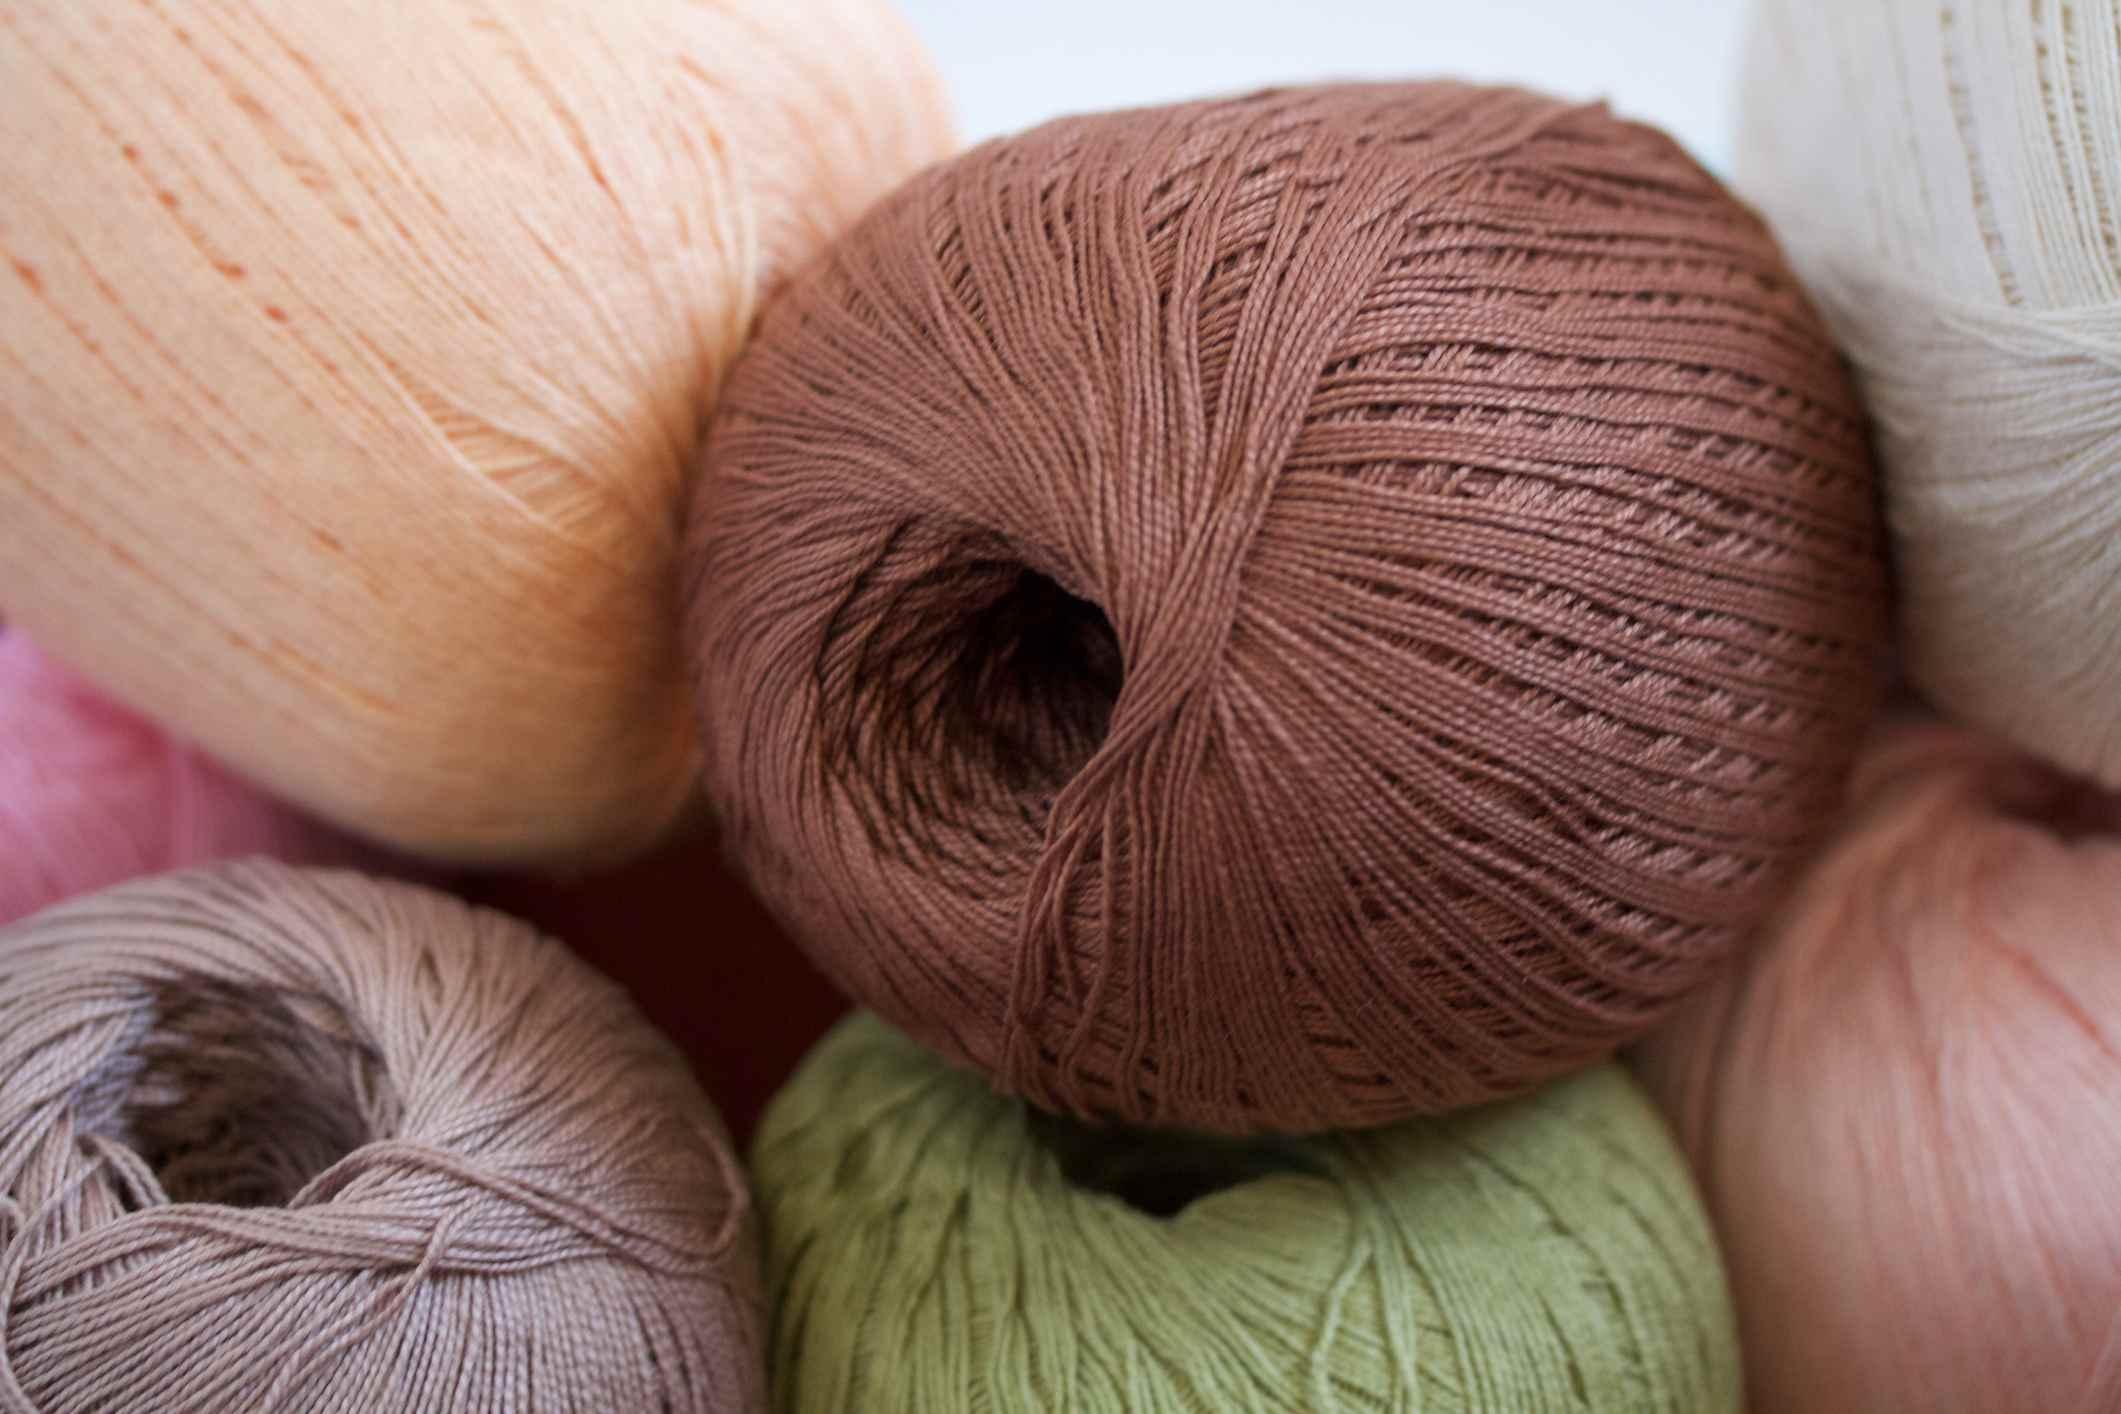 Spools of crochet thread